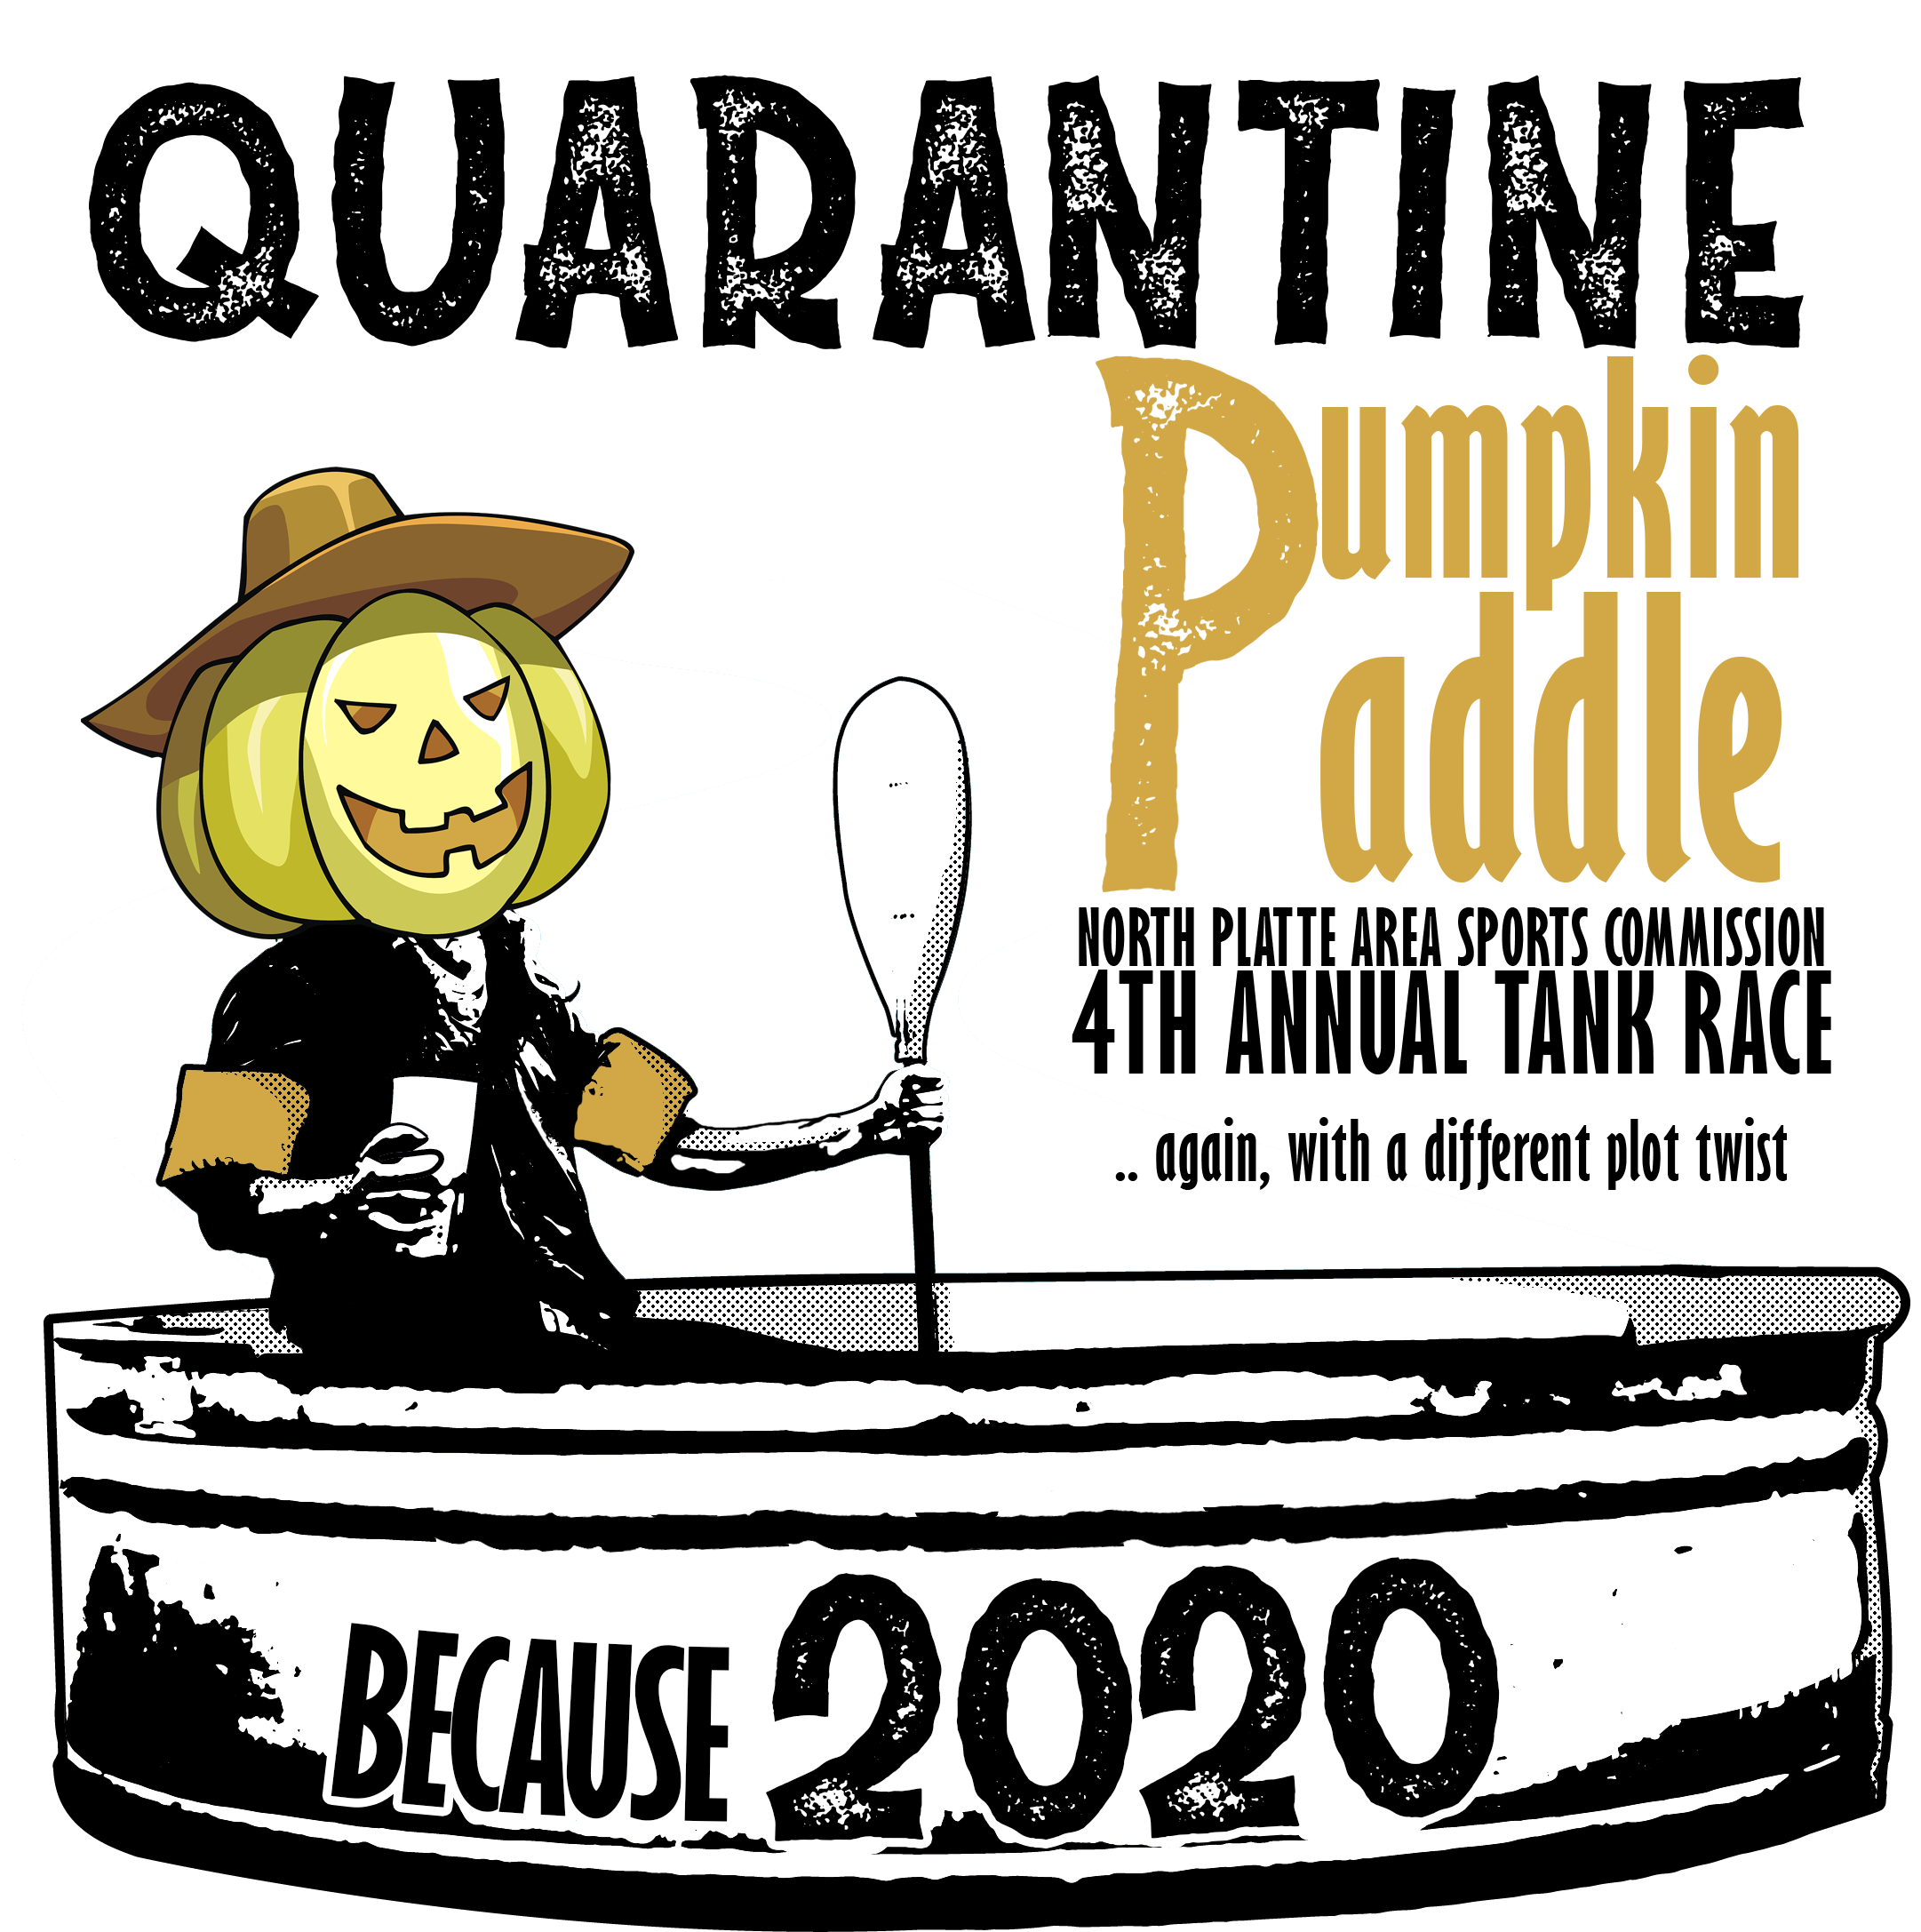 Quarantine, pumpkin paddle, tank race, stock tank, covid, 2020, north platte area sports commission, play north platte, 4th annual tank race, north platte, nebraska, dusty trails, outfitter, platte river, ne